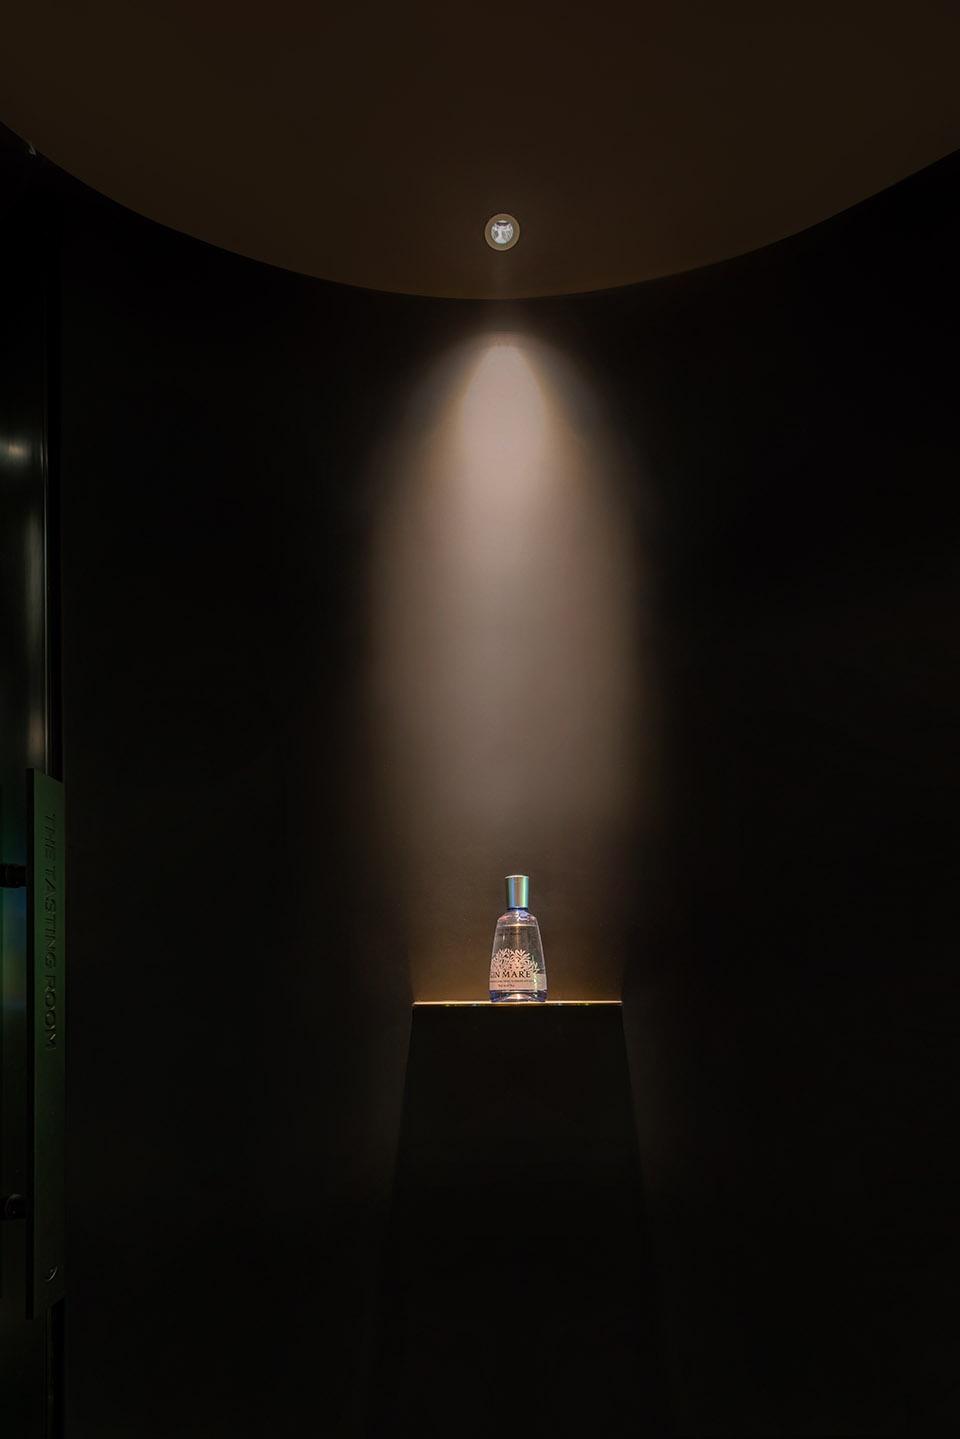 026-the-tasting-room-china-by-ge-studio-960x1439.jpg